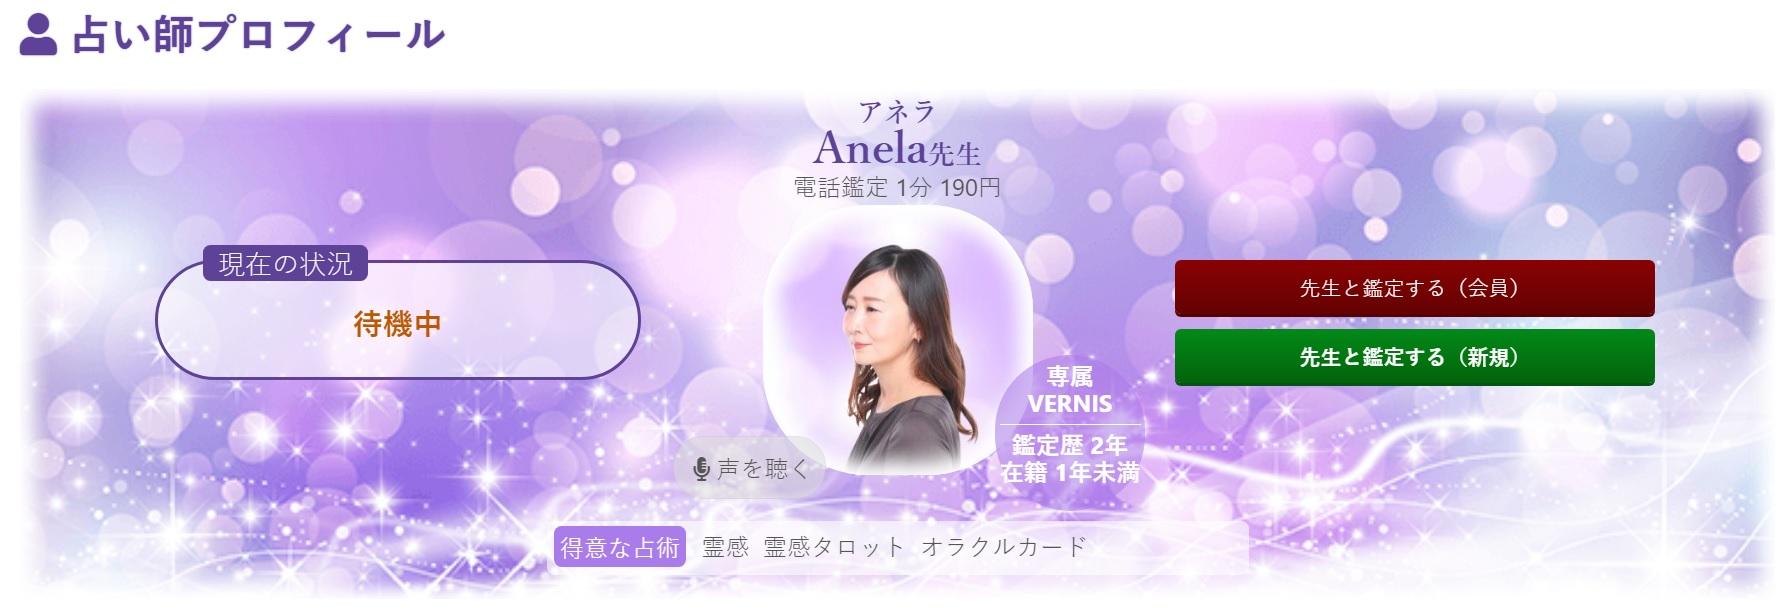 Anela先生 トップ